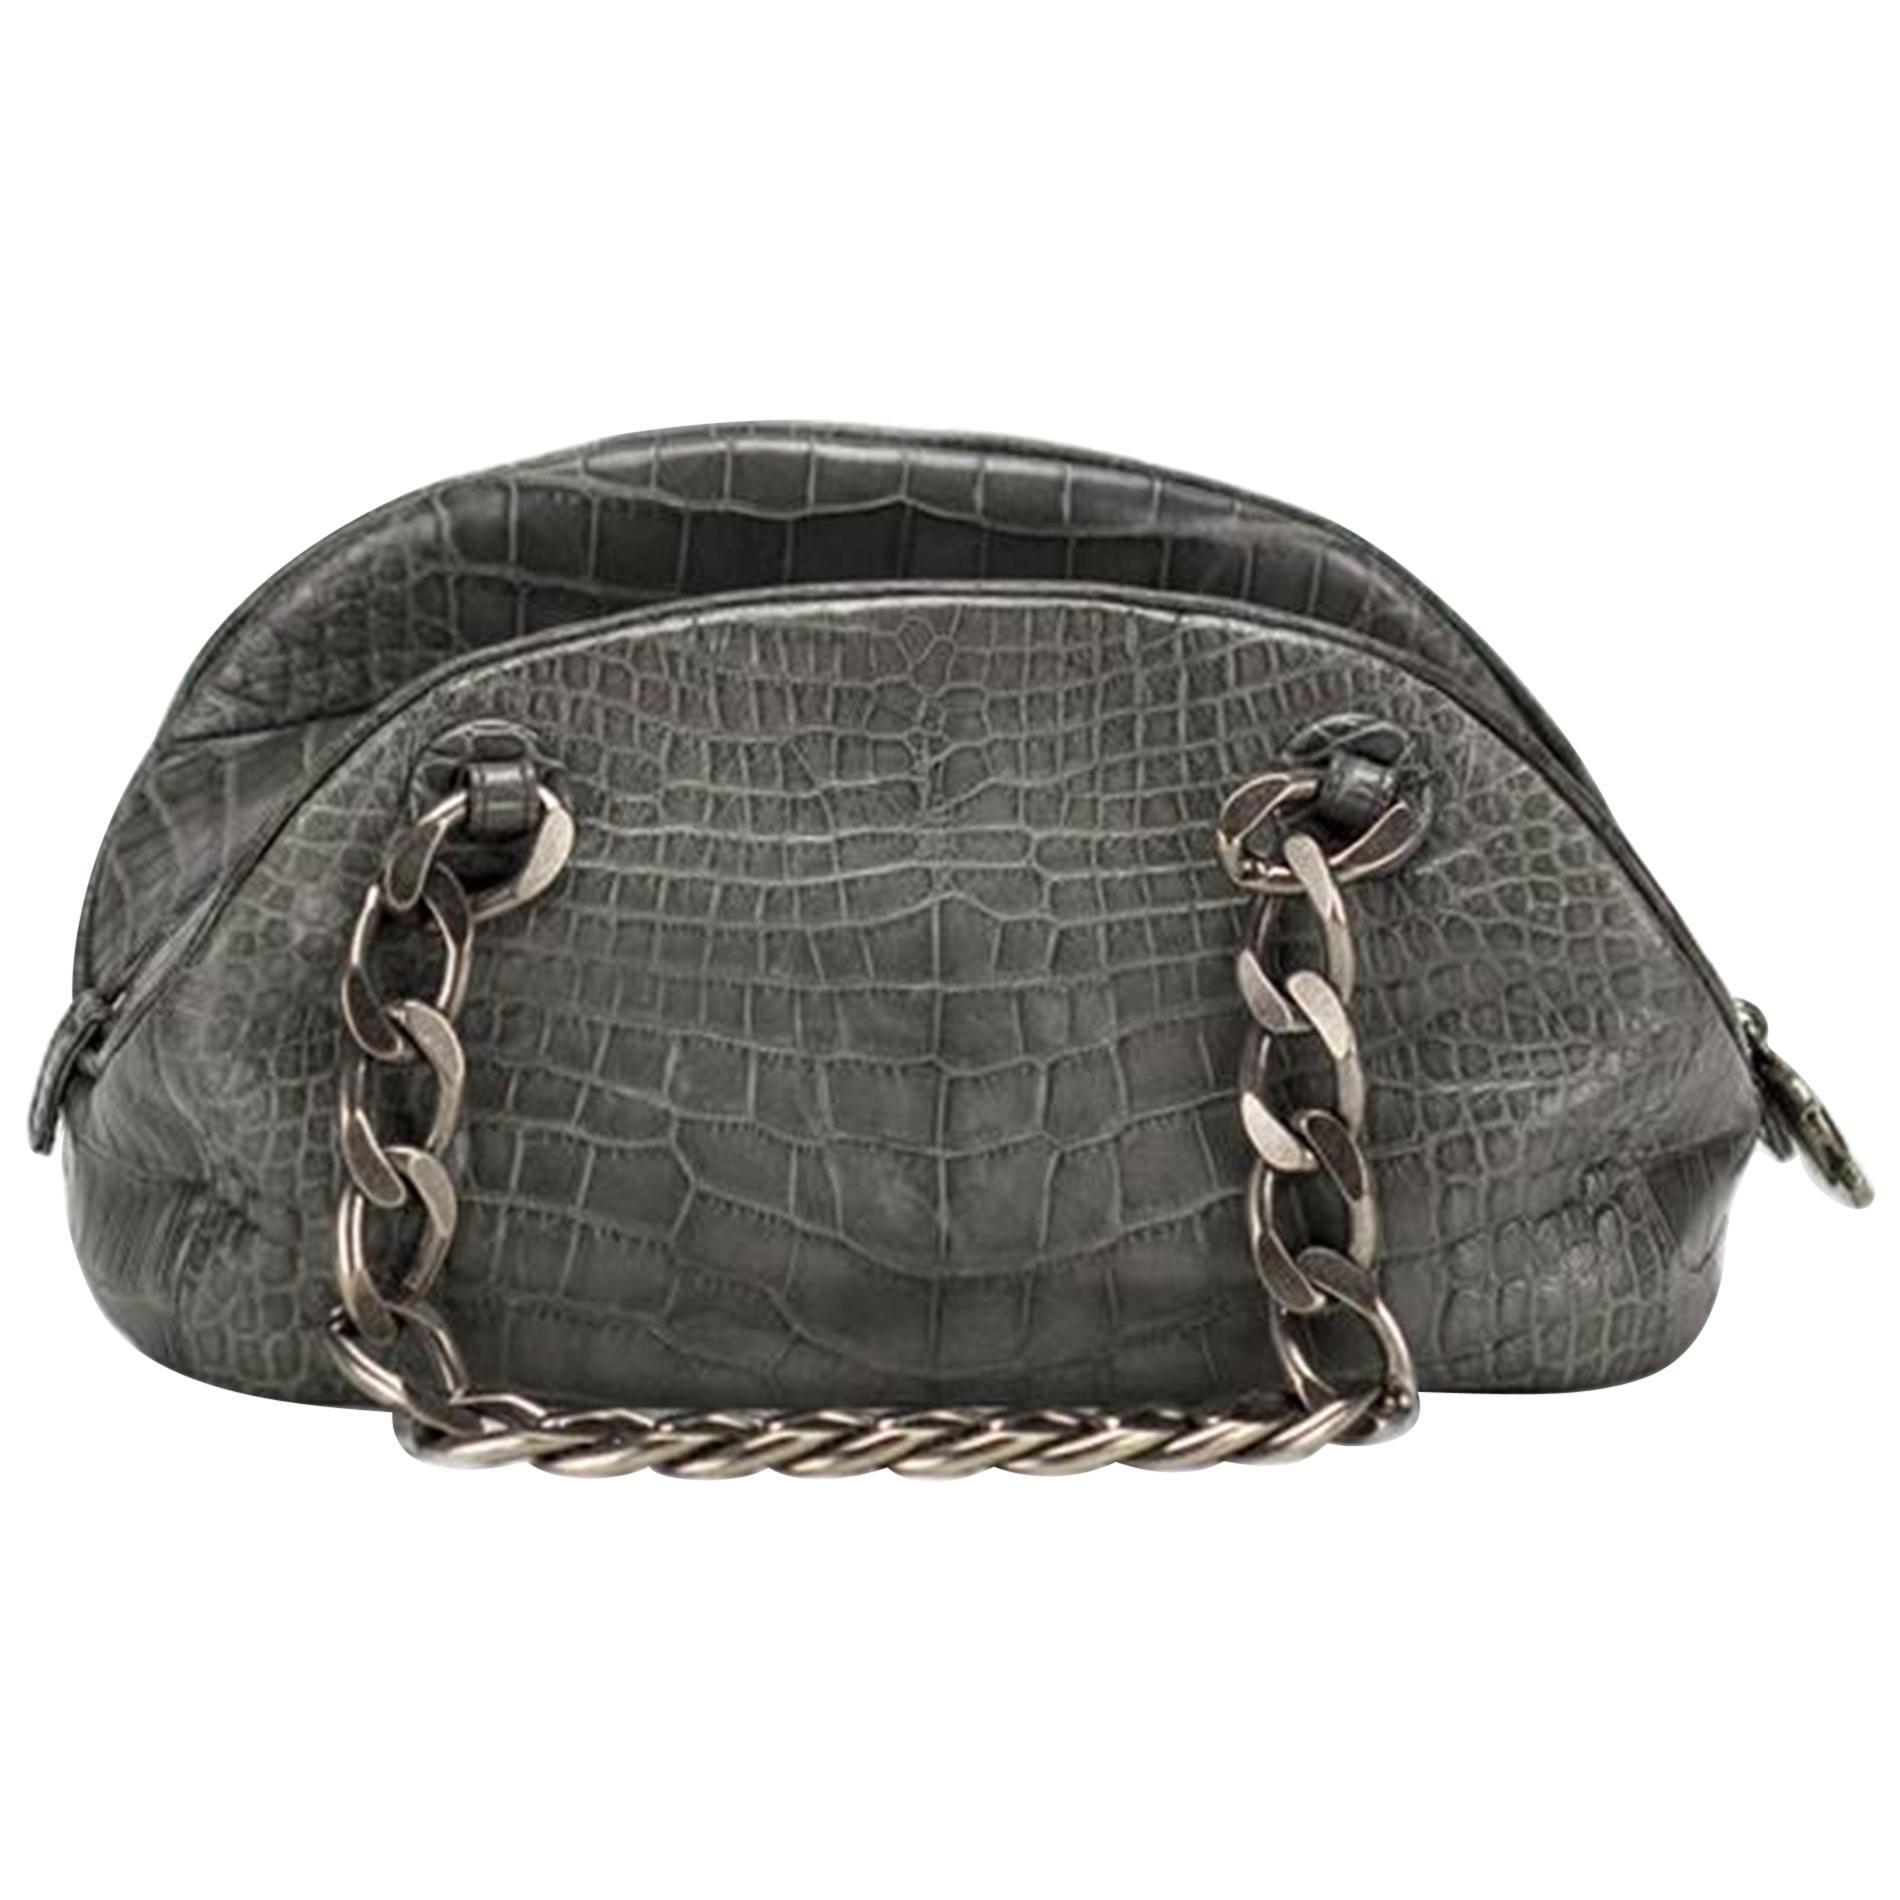 Chanel Bowling Bag Exotic Bowler Paris NY Grey Crocodile Skin Leather Satchel